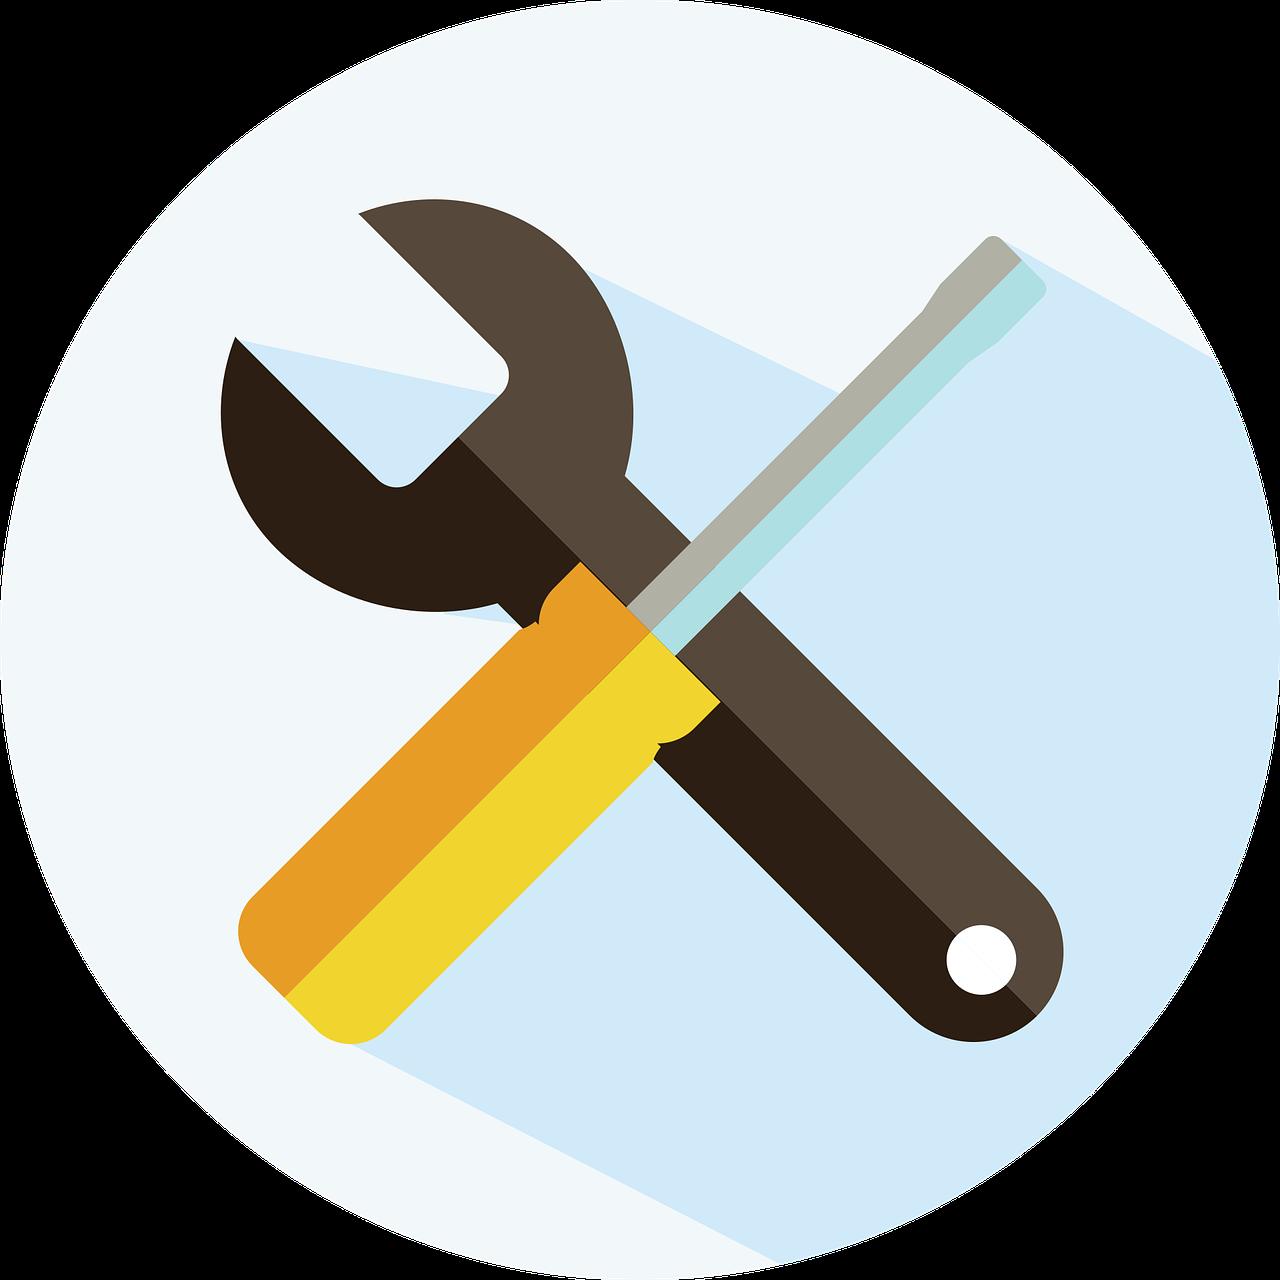 tool, setting, tools